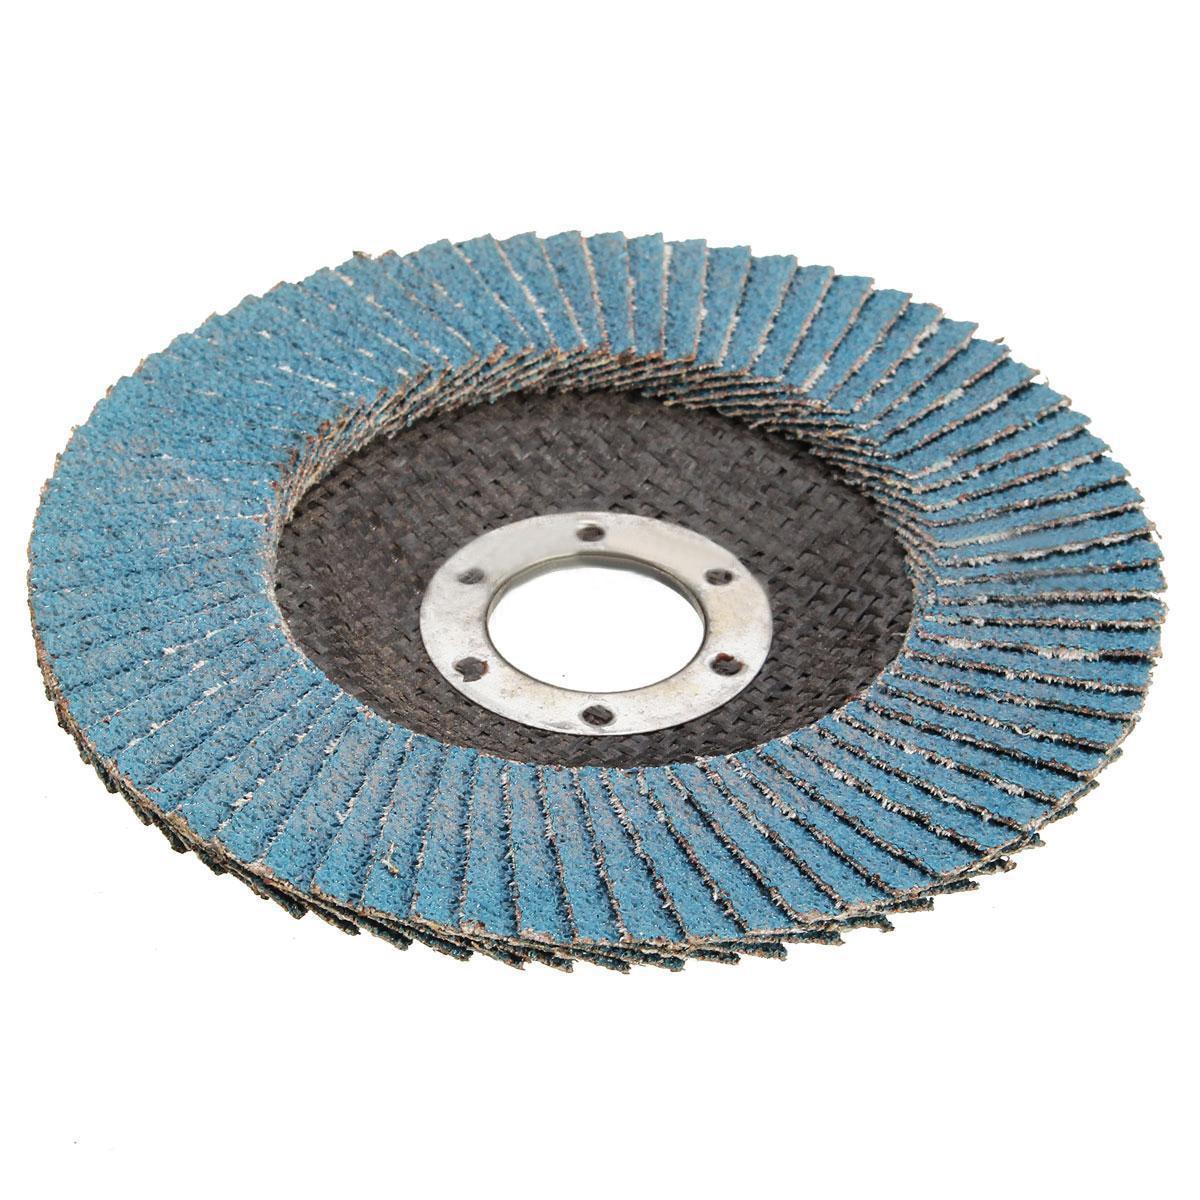 10 Pcs 4-1//2 X 7//8 120 Grits Premium Zirconia Flap Discs Grinding Wheel Sandpaper for Grinding